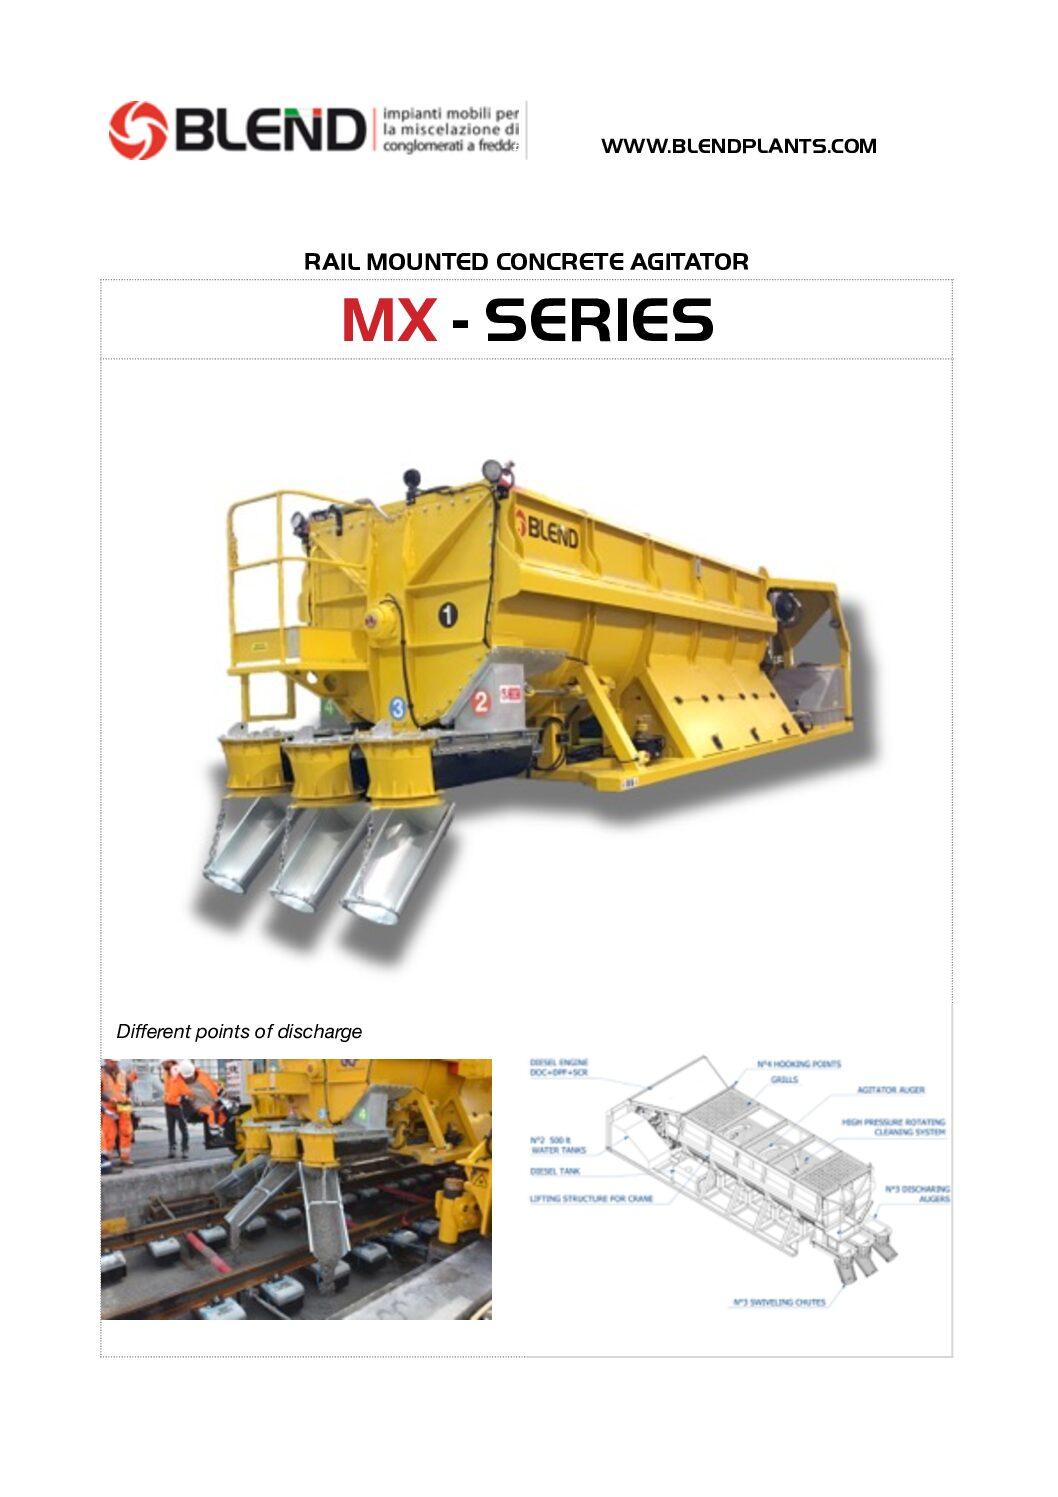 Blend MX08 Features